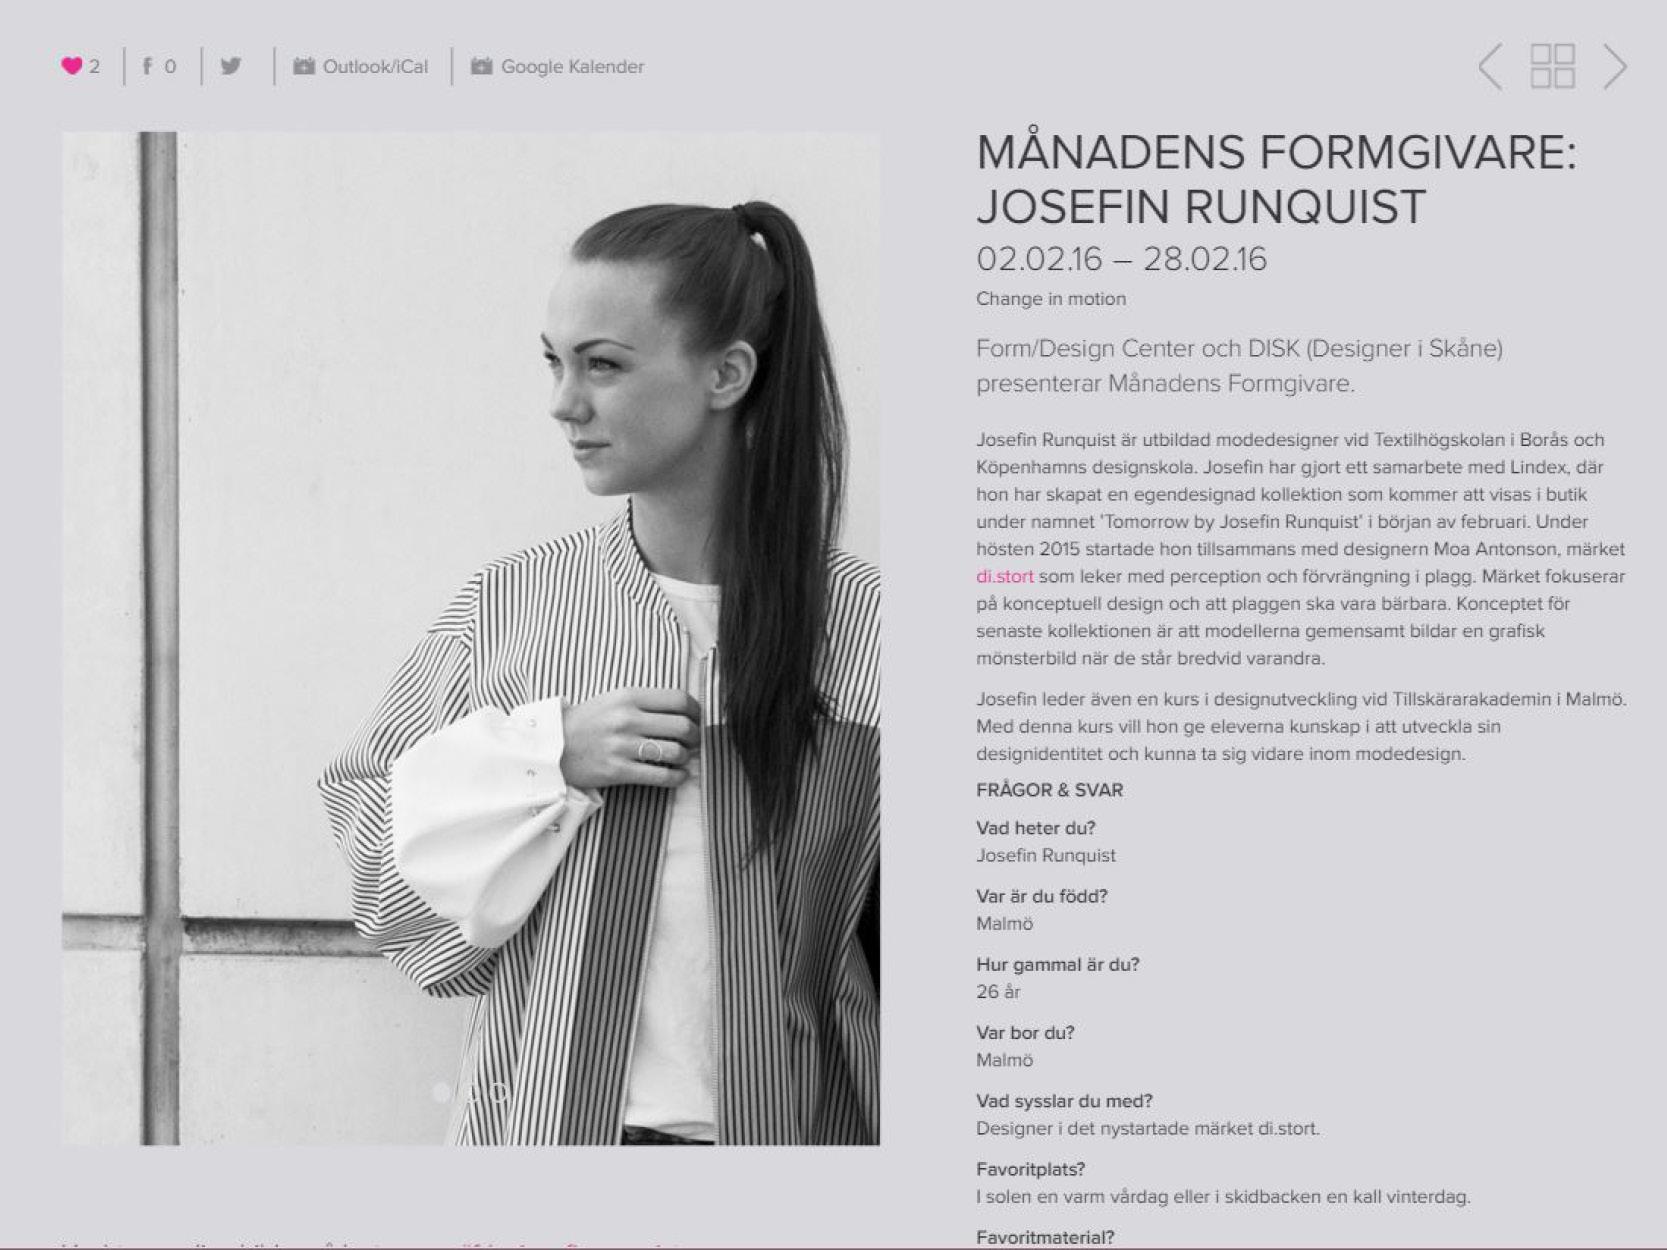 josefin runquist6